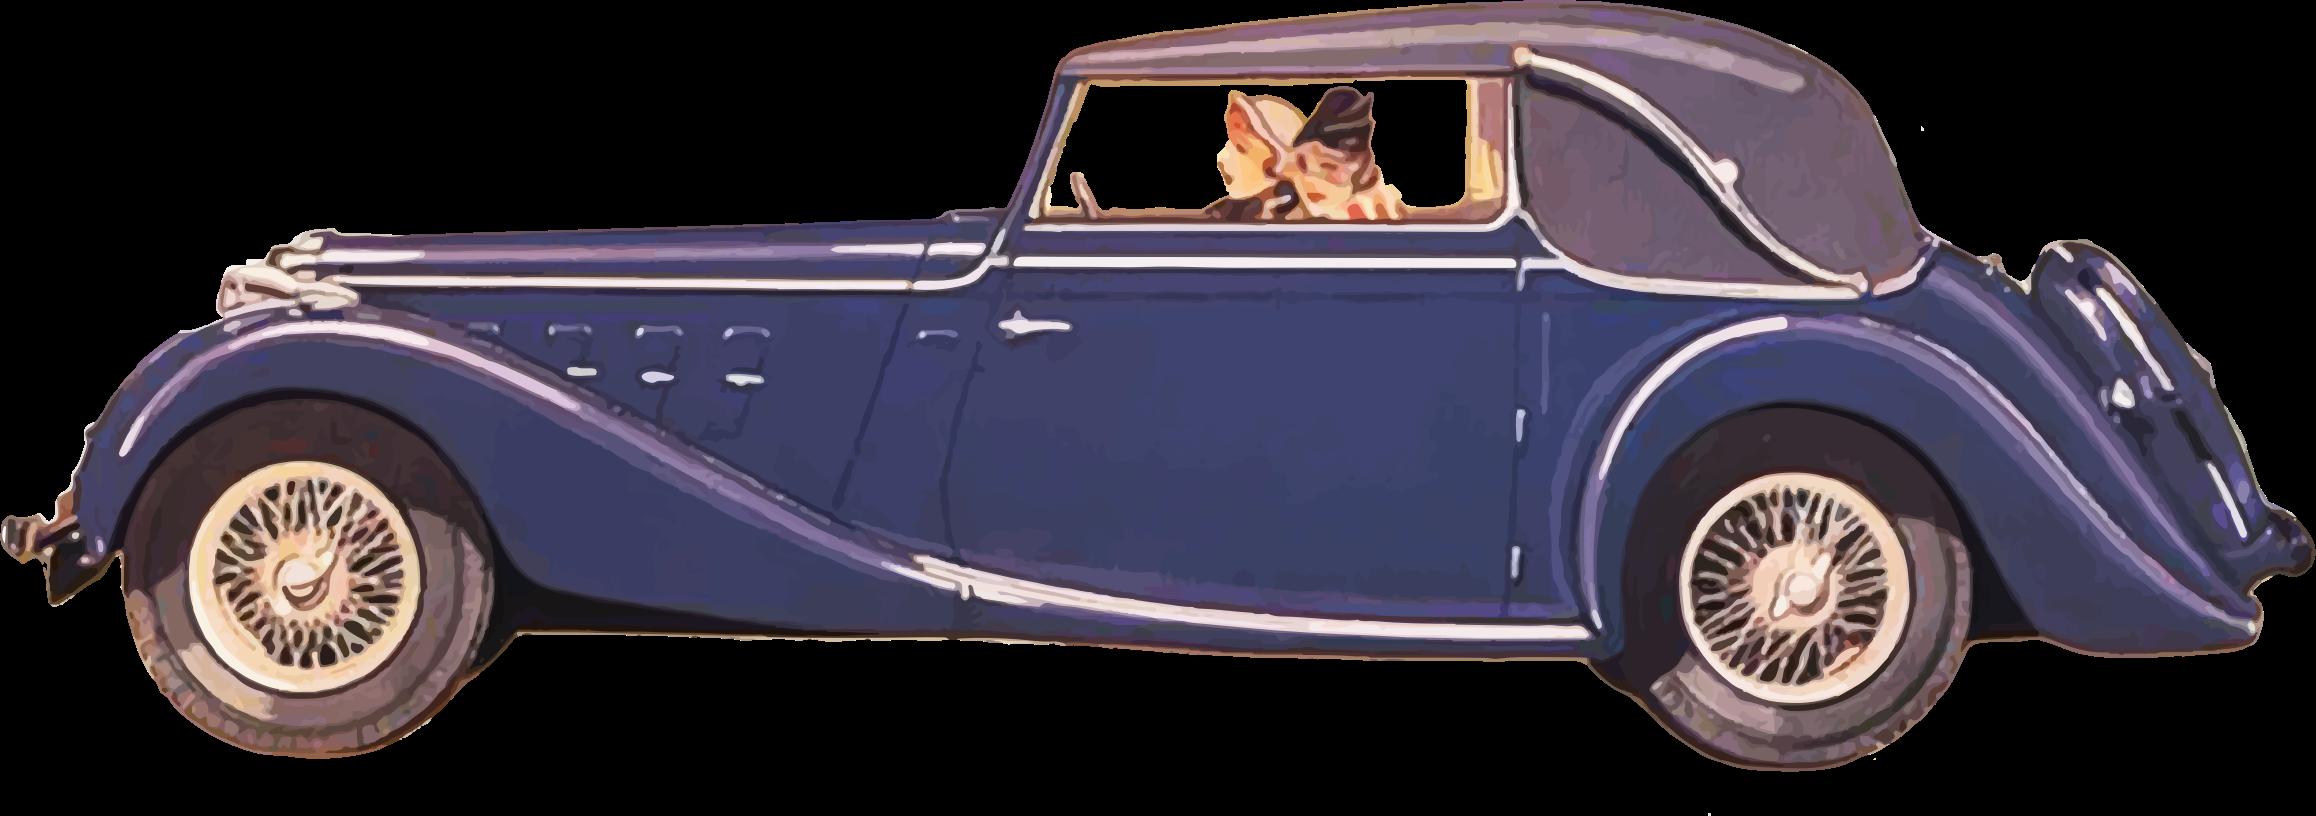 Driver clipart woman driver. Ladies driving vintage car